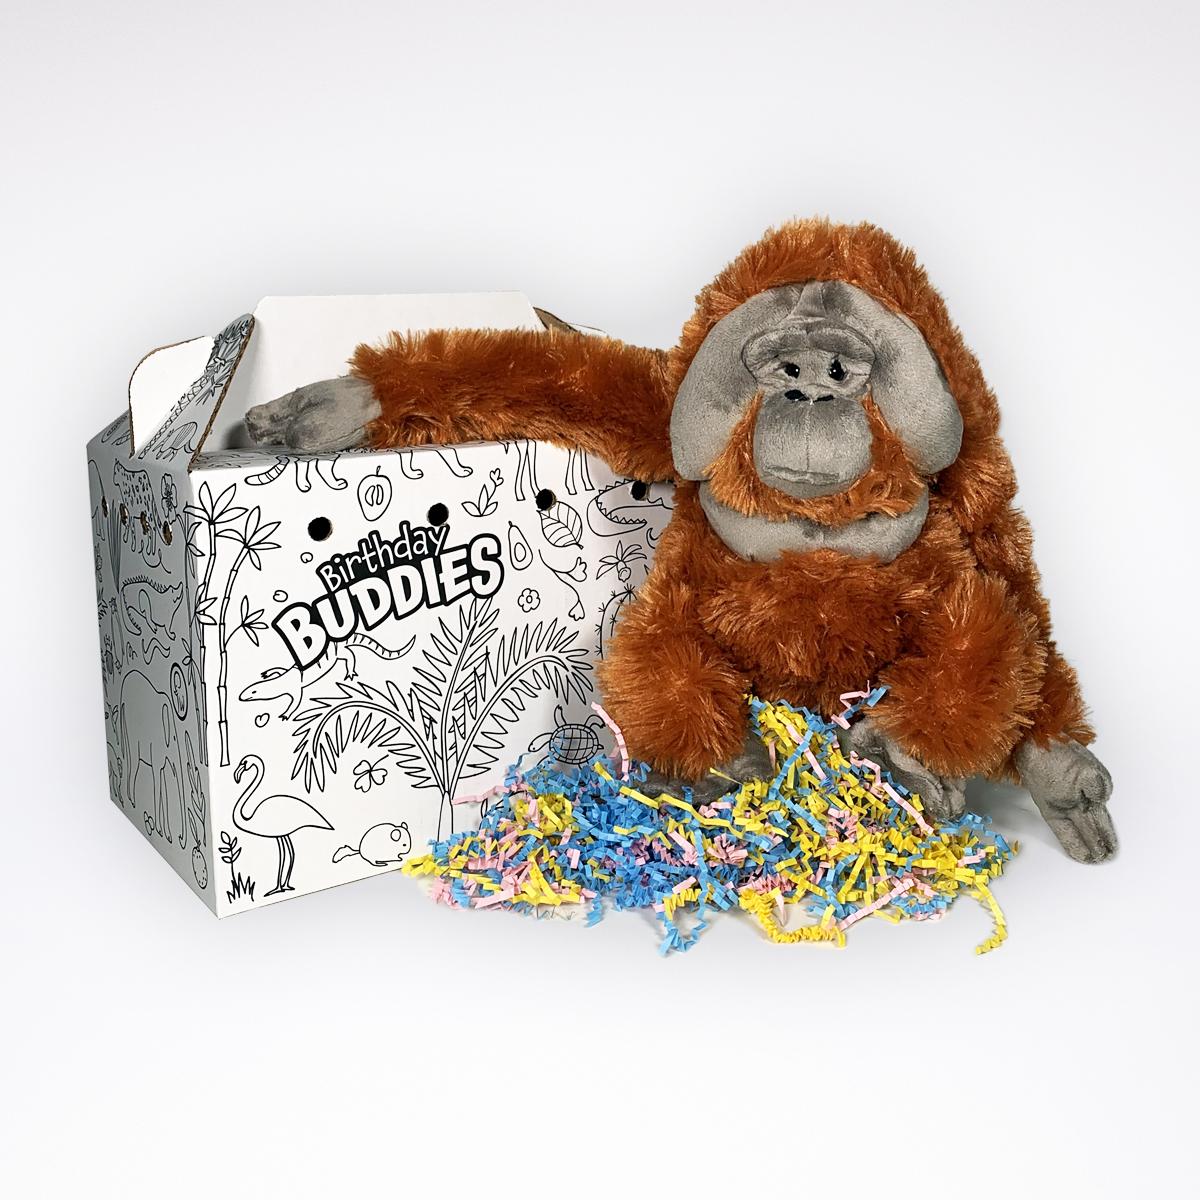 photo of stuffed orangutan next to a special birthday buddies adoption box